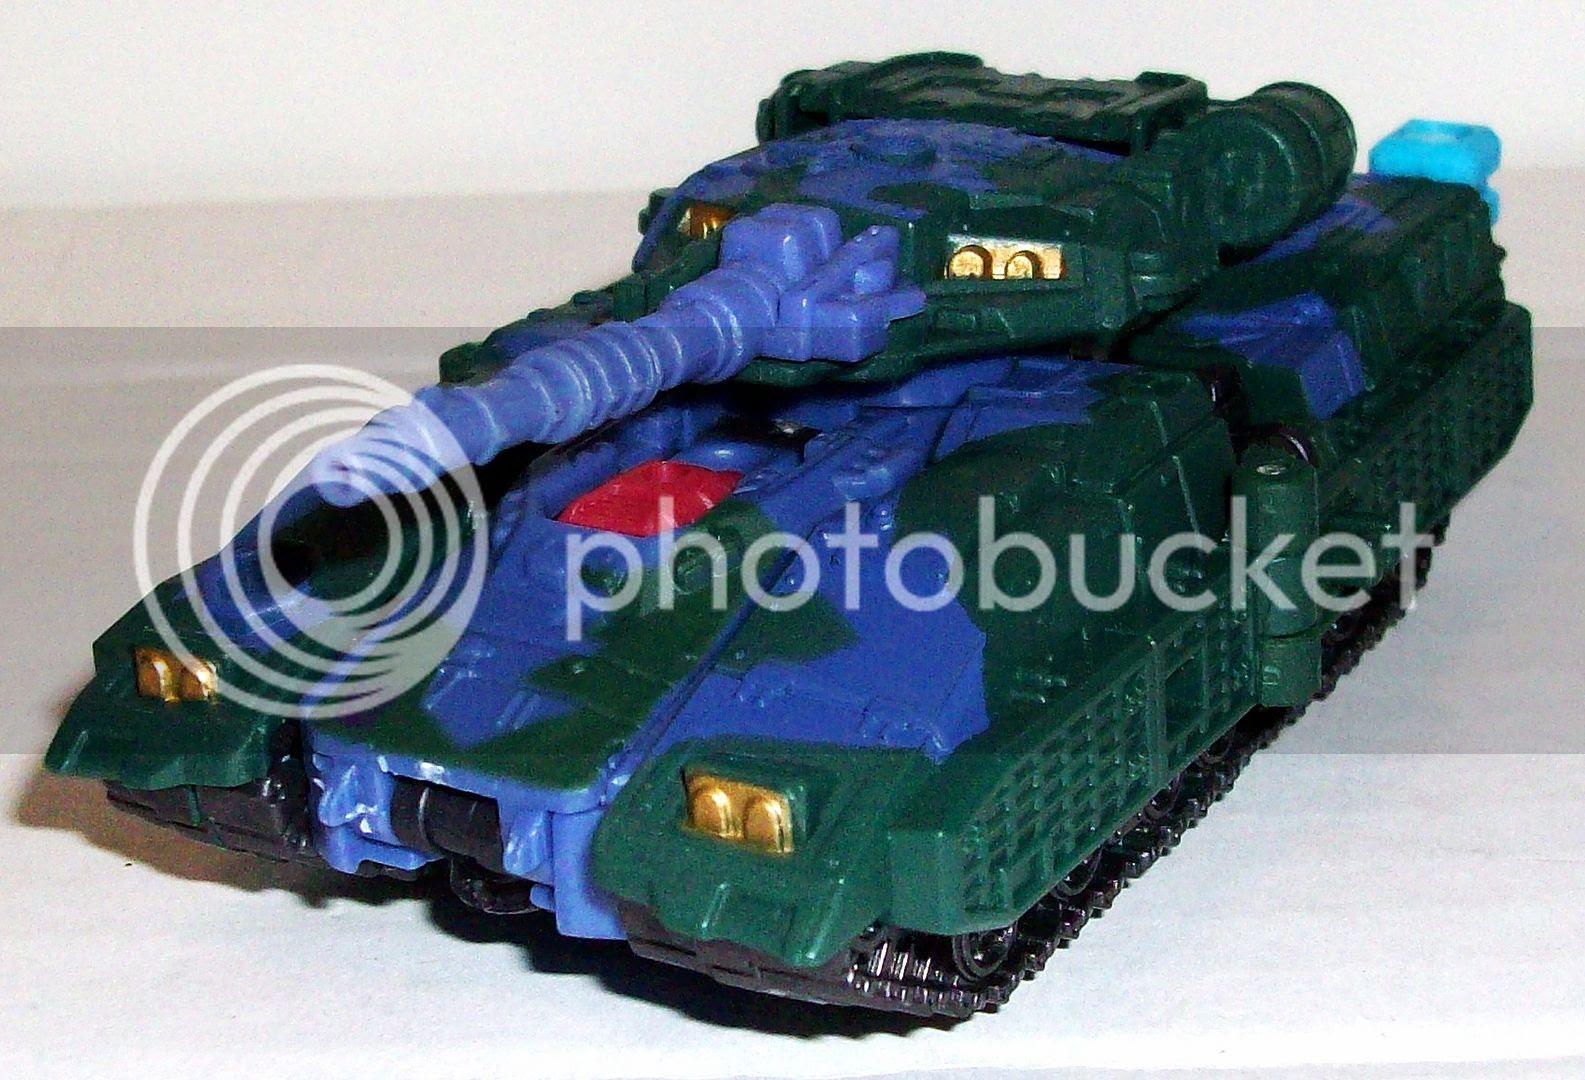 Tank Master photo Dec15041.jpg